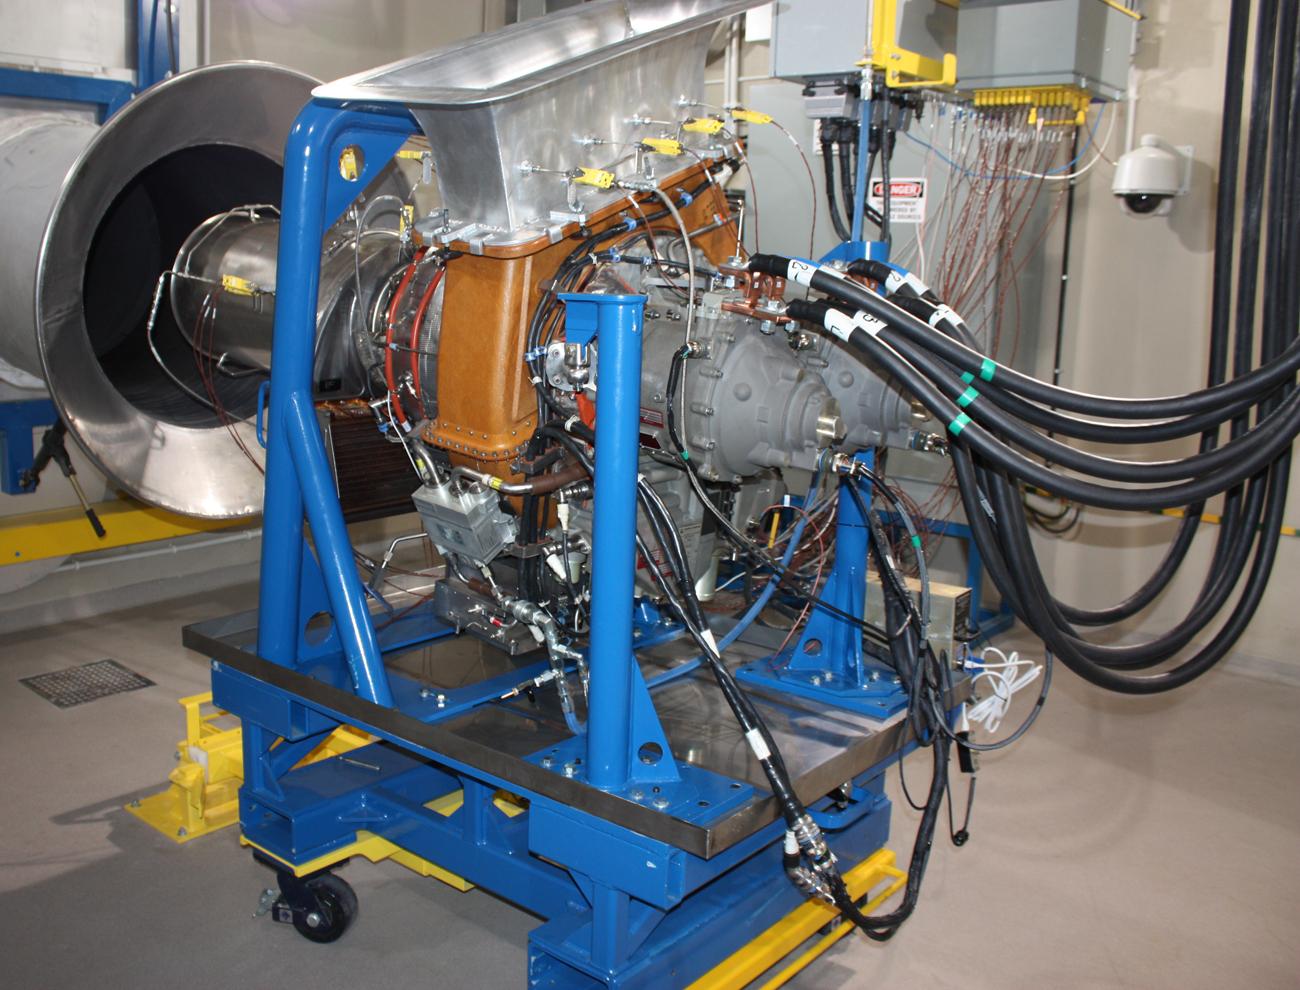 Apu Test Cells Cel Aerospace Aircraft Engine Wiring